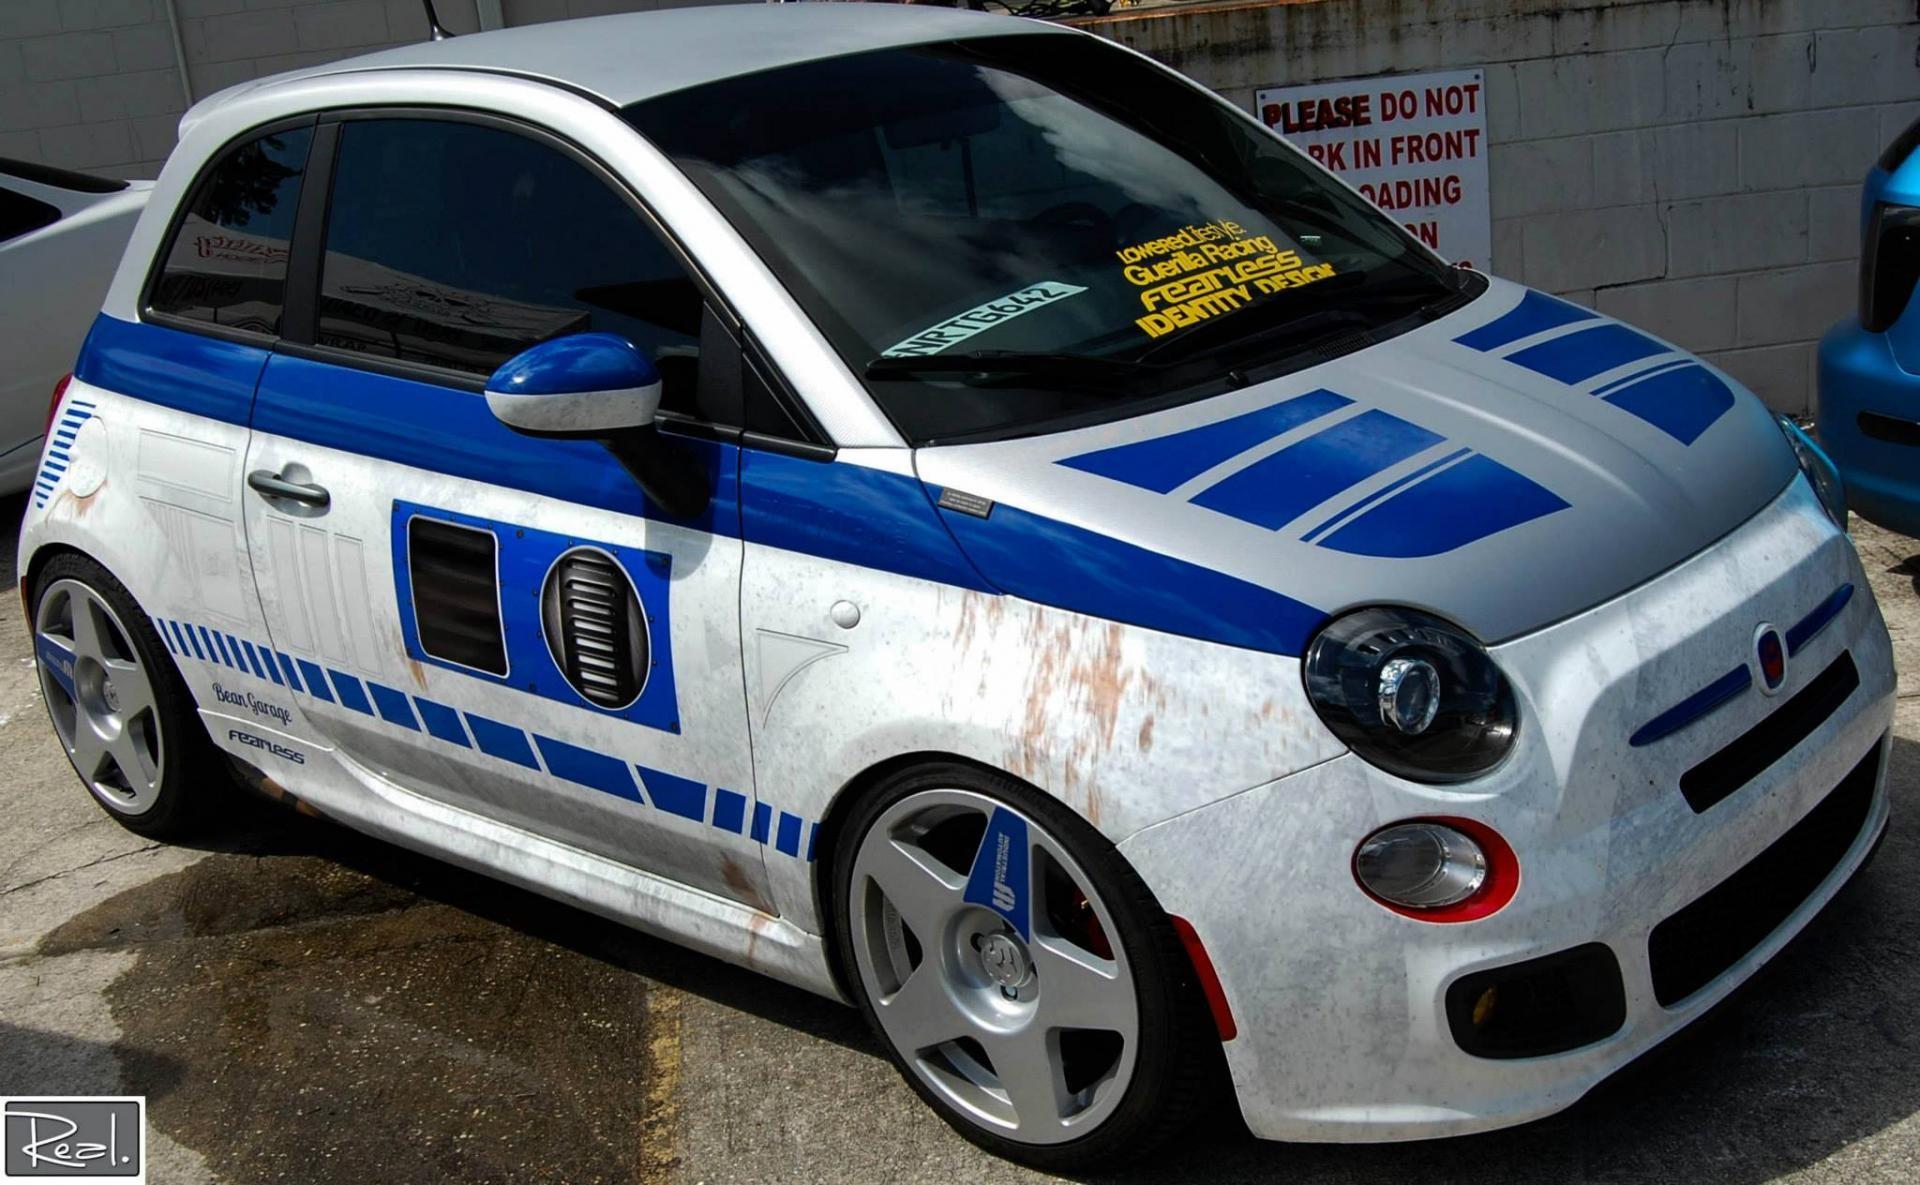 Car Wars: Top 13 Best & Craziest Star Wars Cars